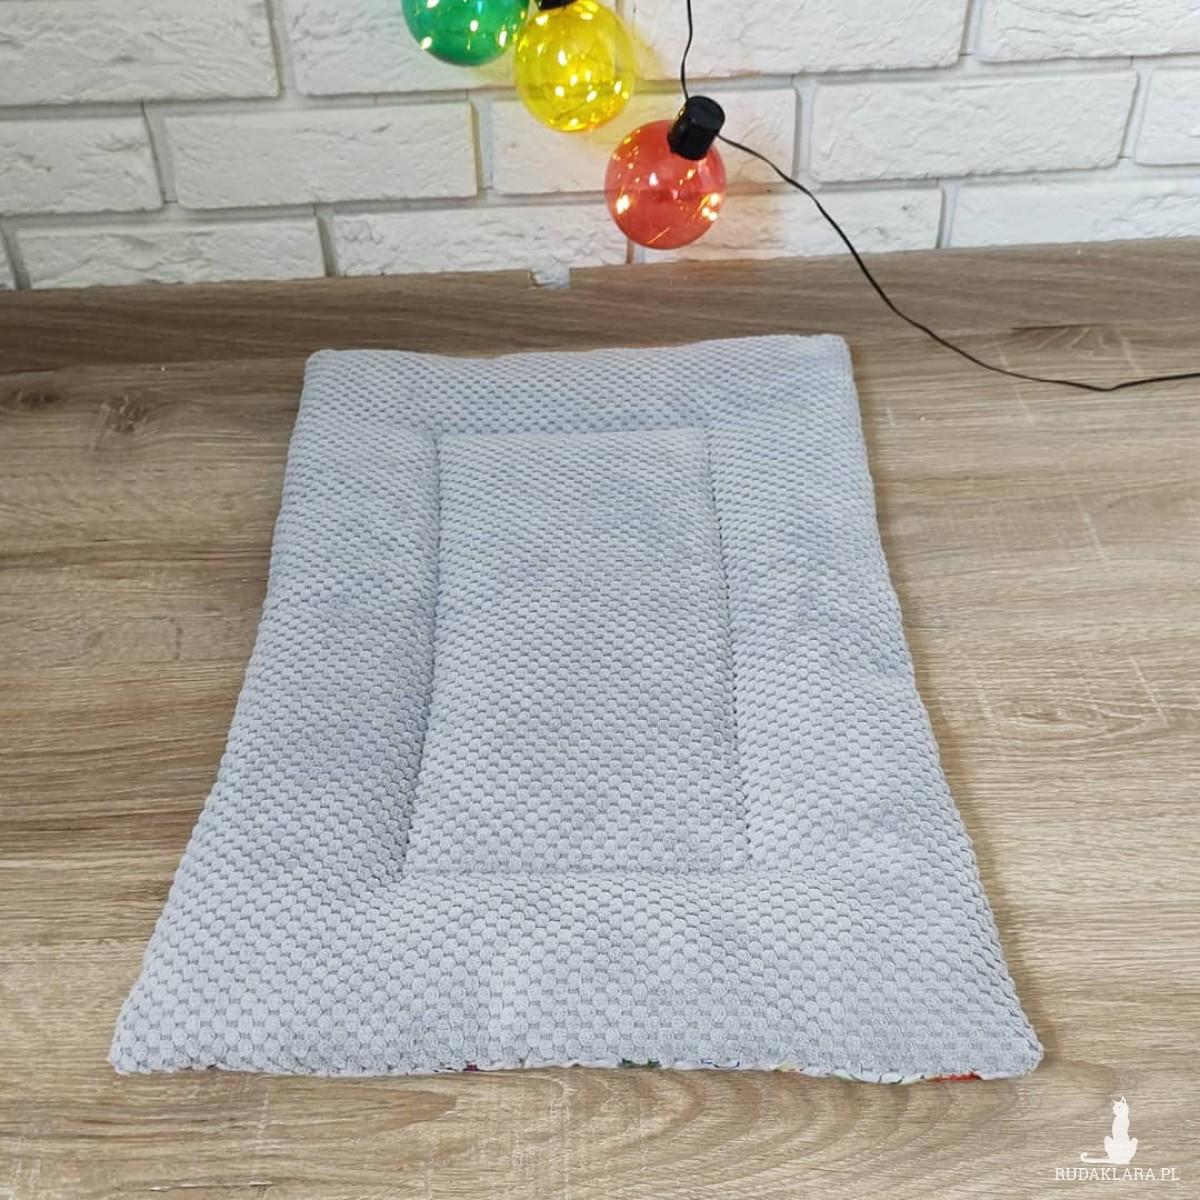 Poduszka legowisko dla psa lub kota